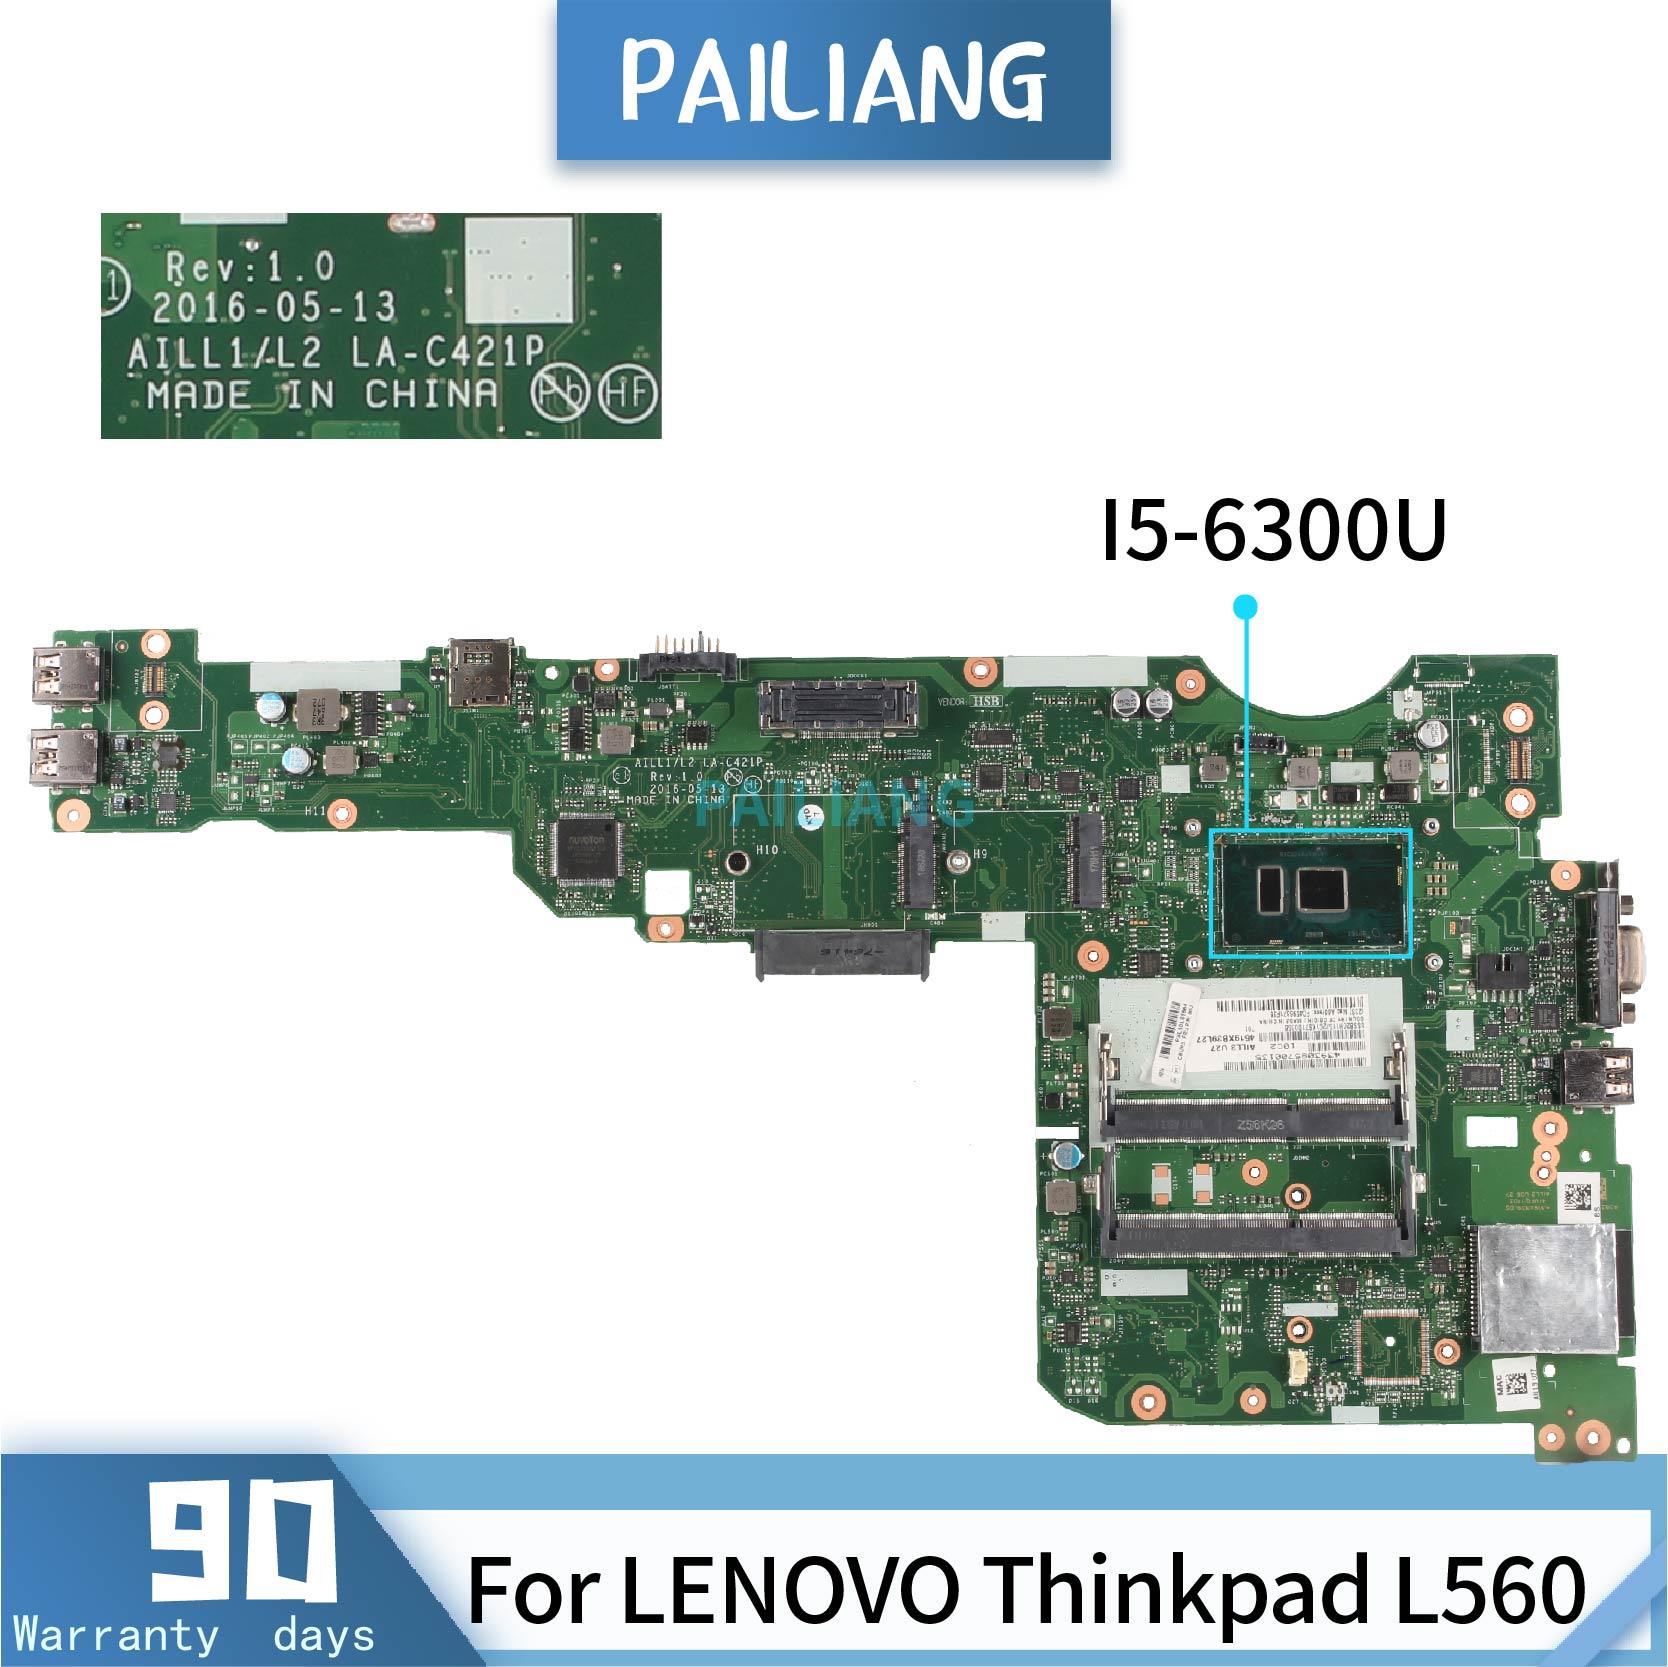 Placa base para portátil PAILIANG para LENOVO Thinkpad L560 LA-C421P placa base Core SR2F0 I5-6300U probado ddr3